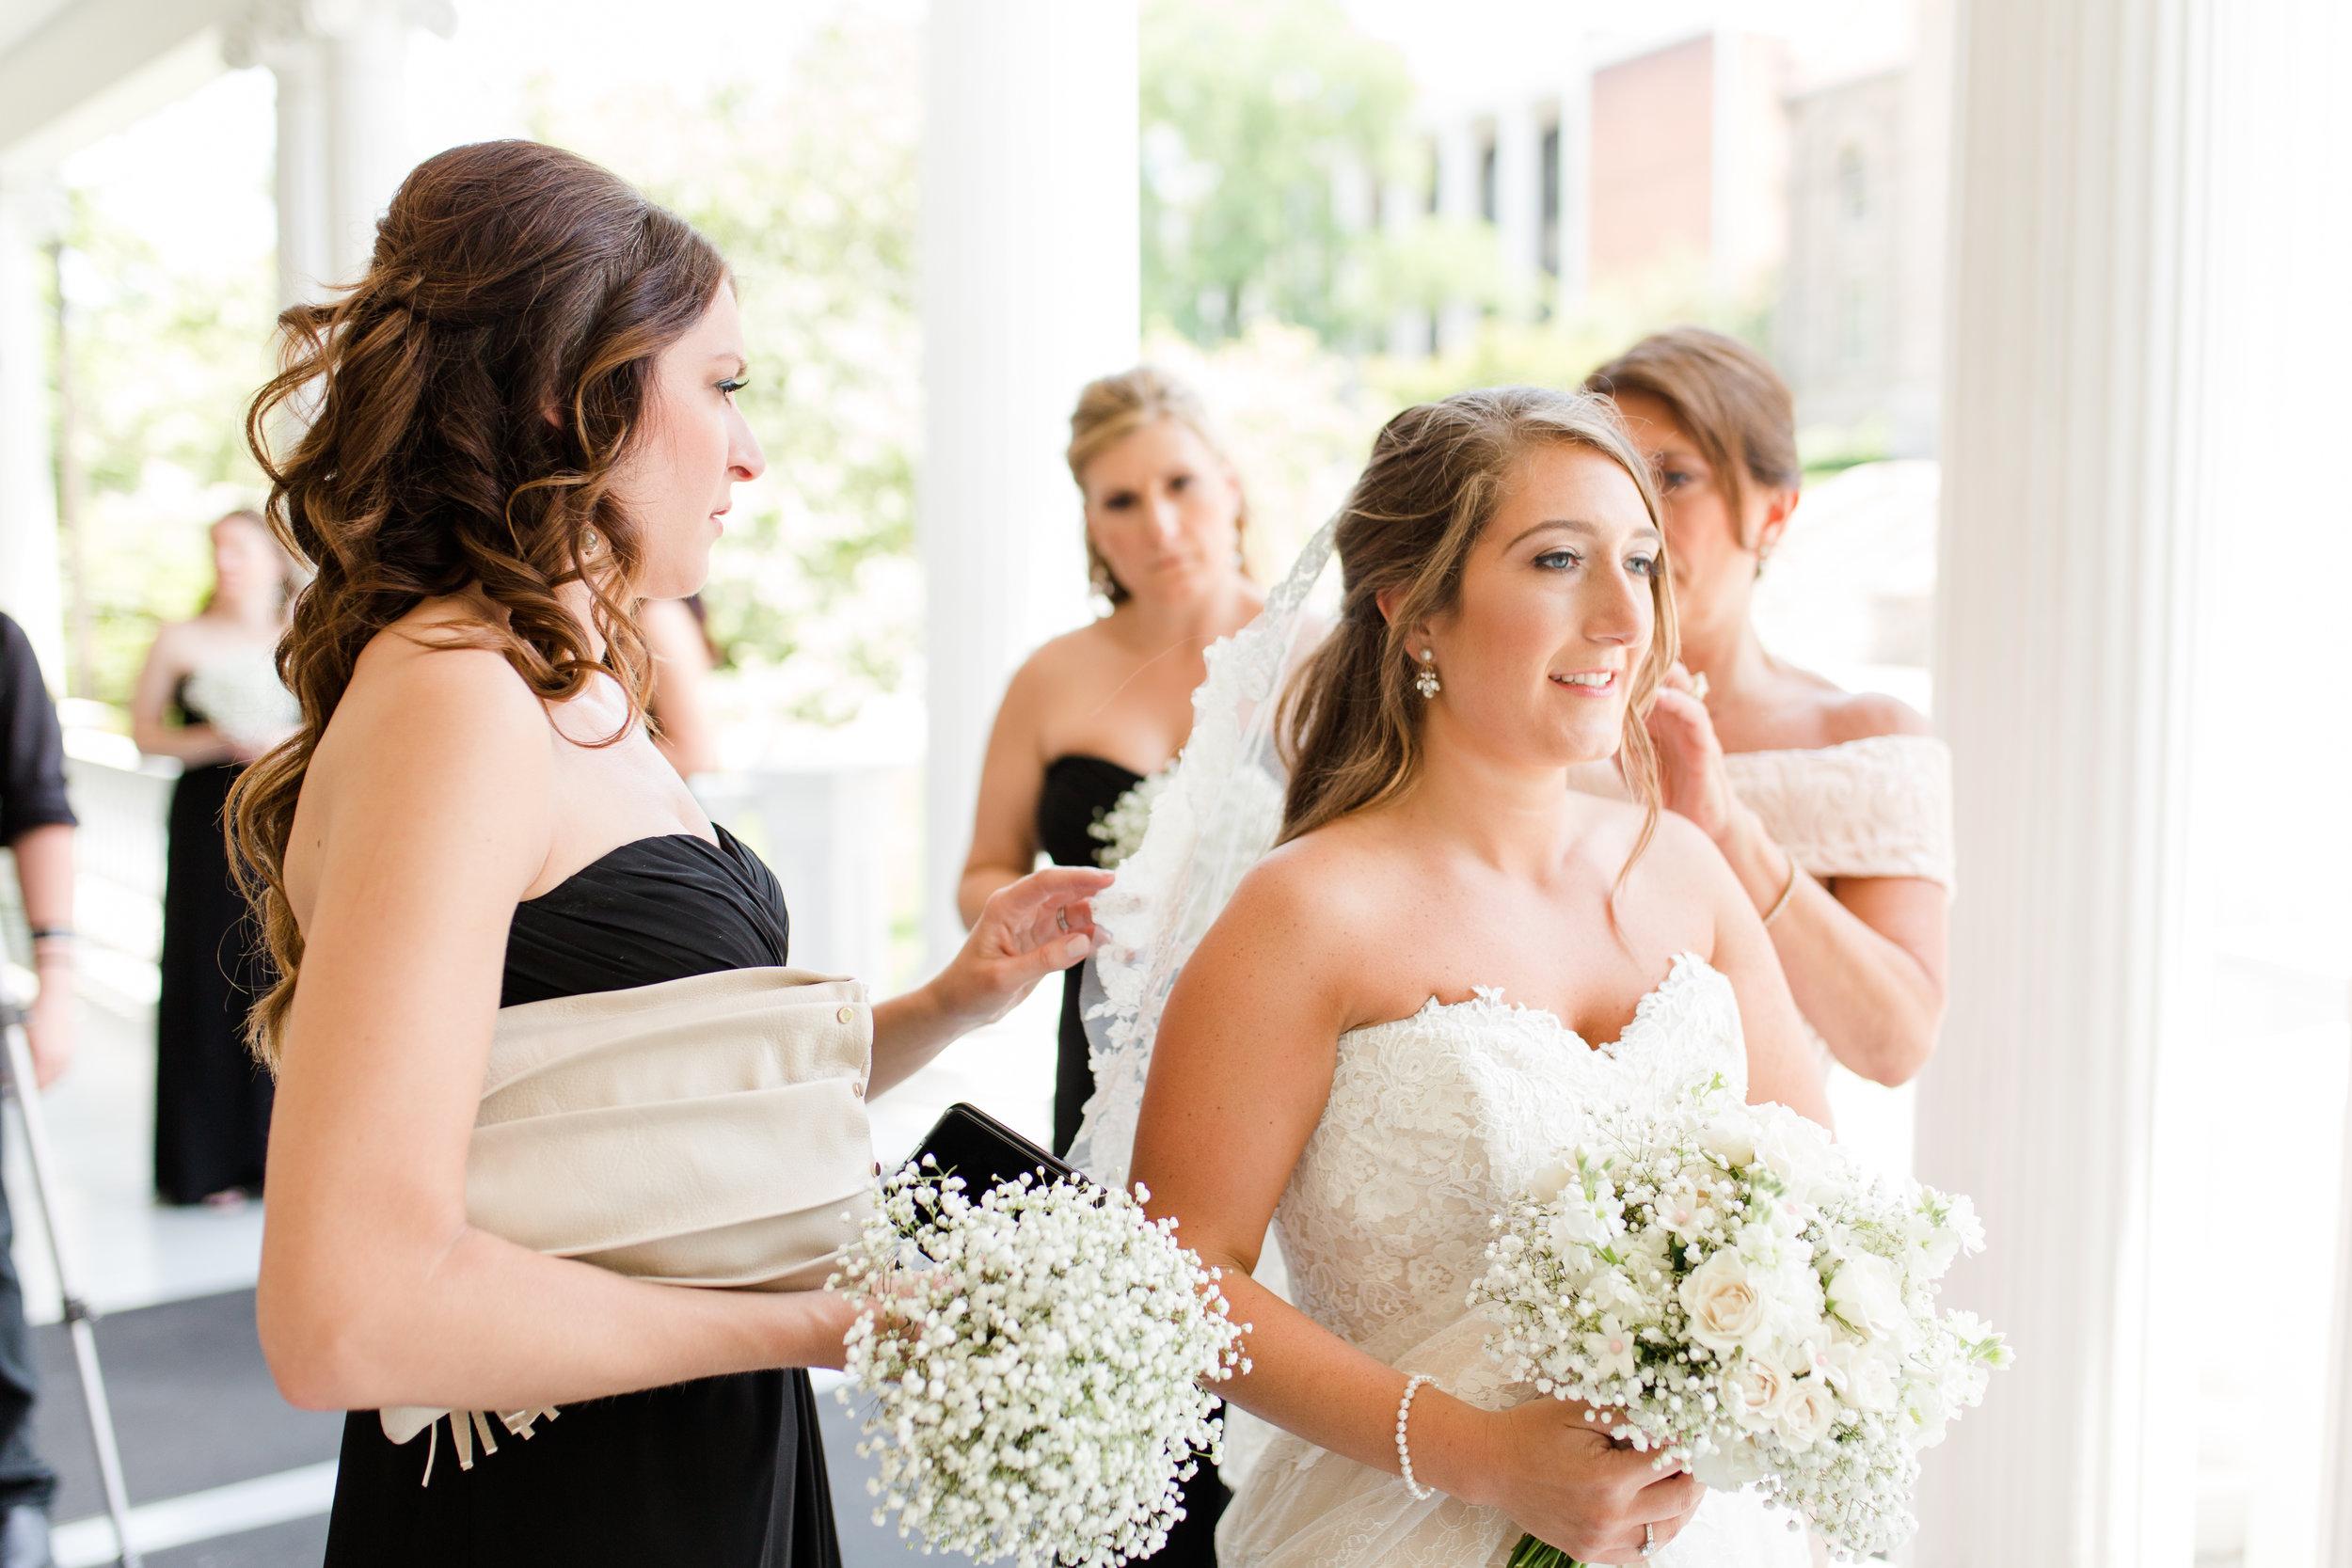 bridals and bridal party-4.jpg